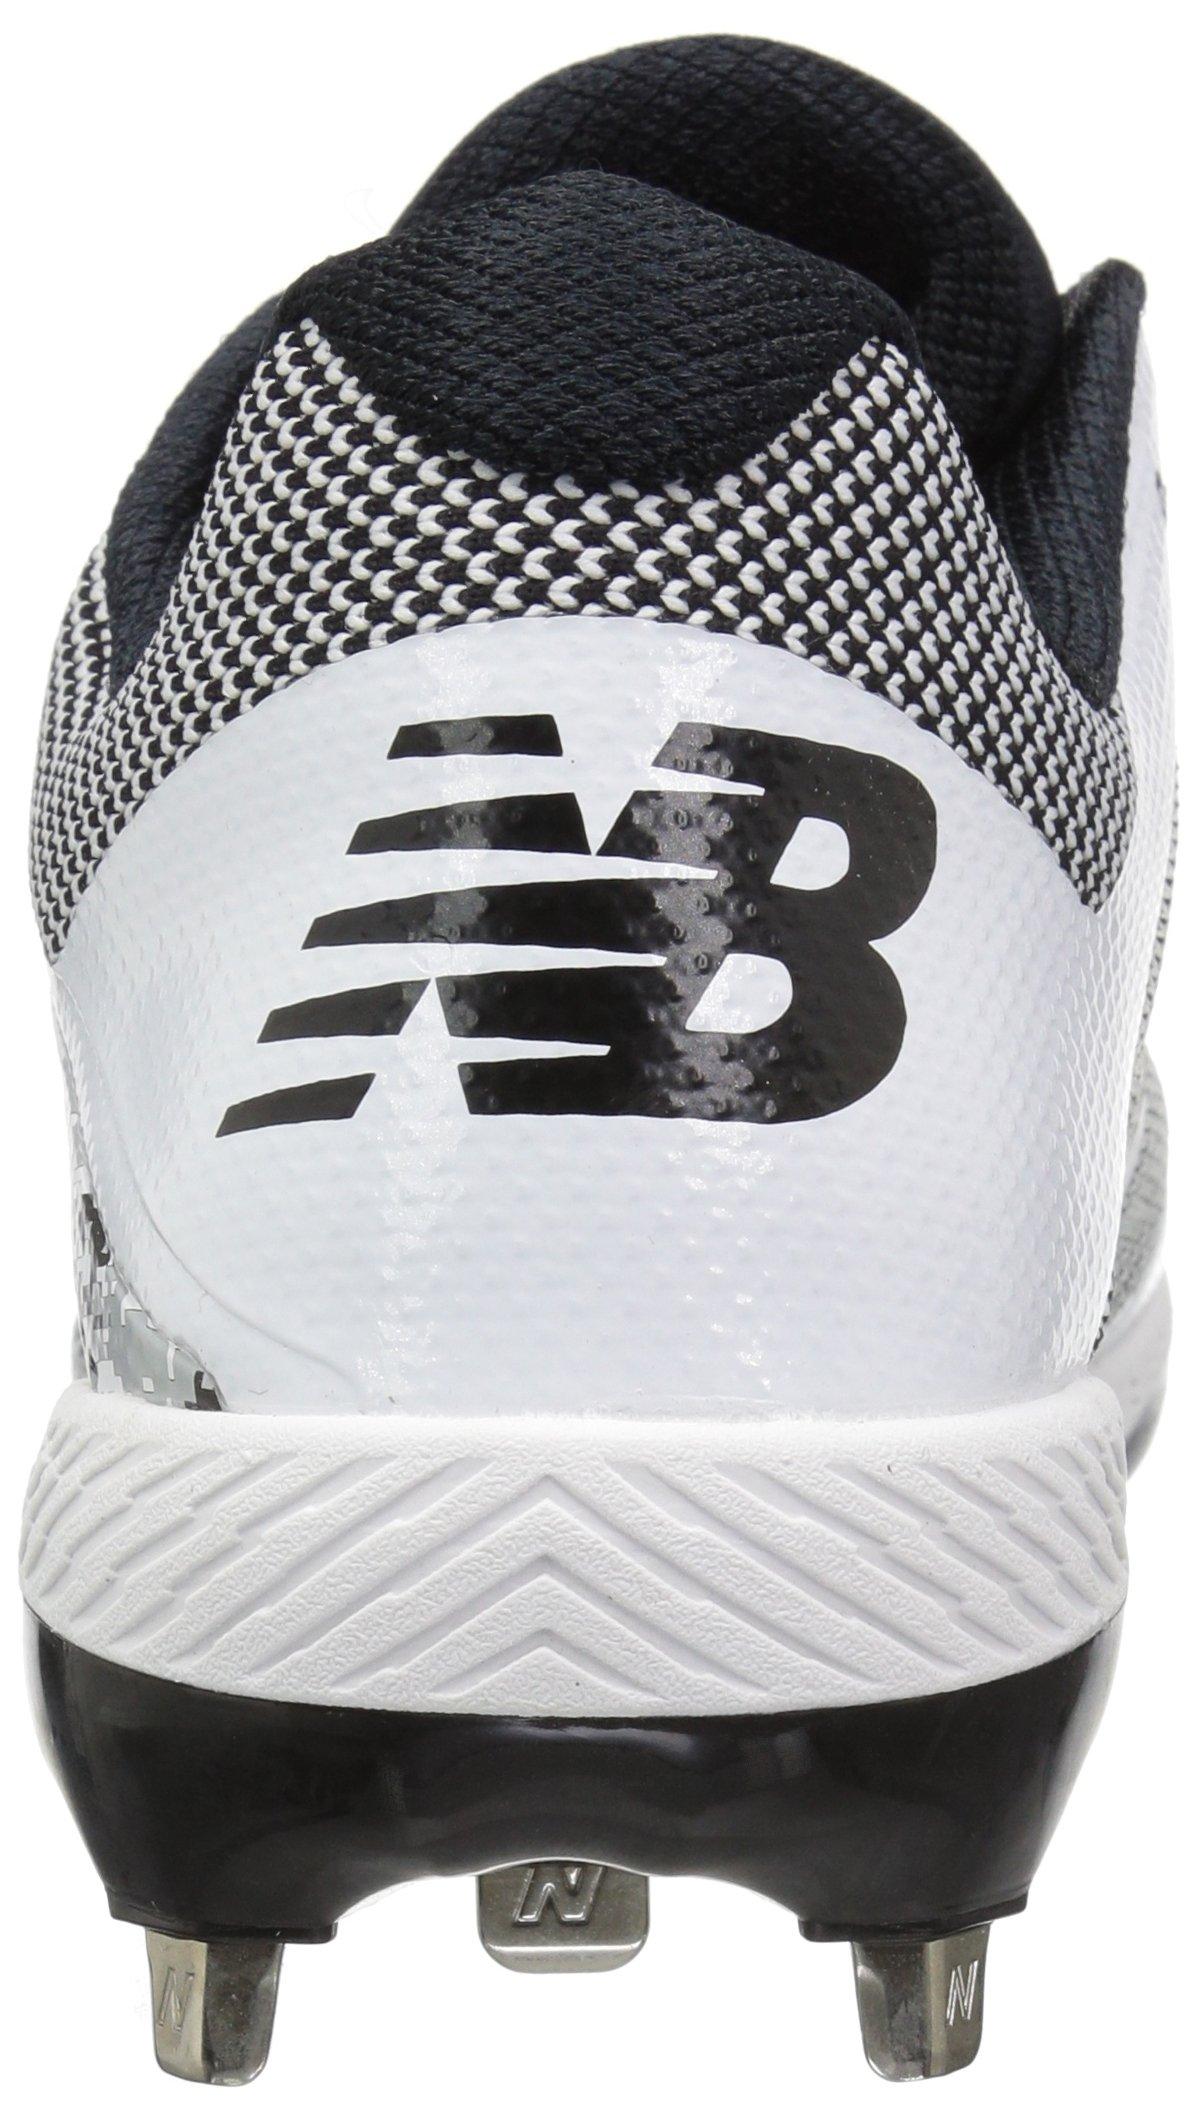 New Balance Men's L4040v4 Metal Baseball Shoe, Silver/Camo, 7.5 2E US by New Balance (Image #2)